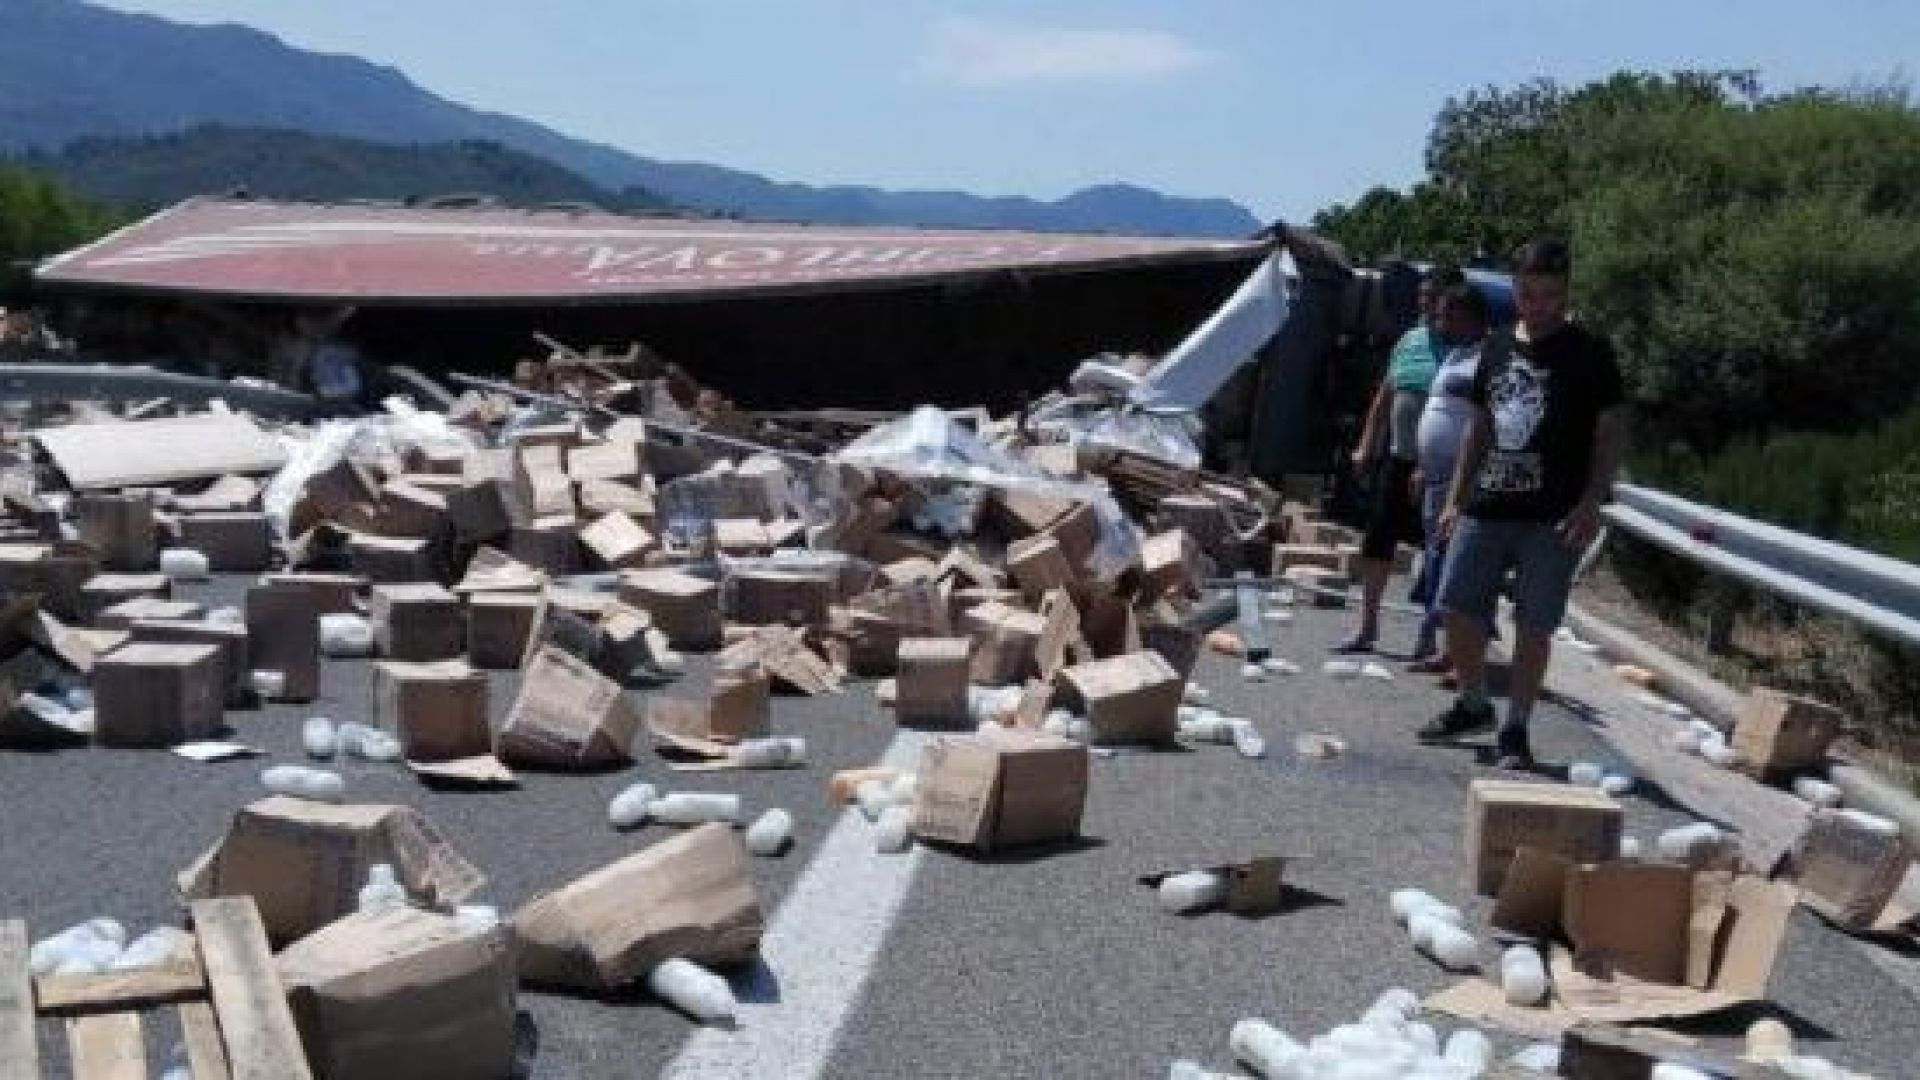 Български ТИР затвори магистрала между Атина и Солун